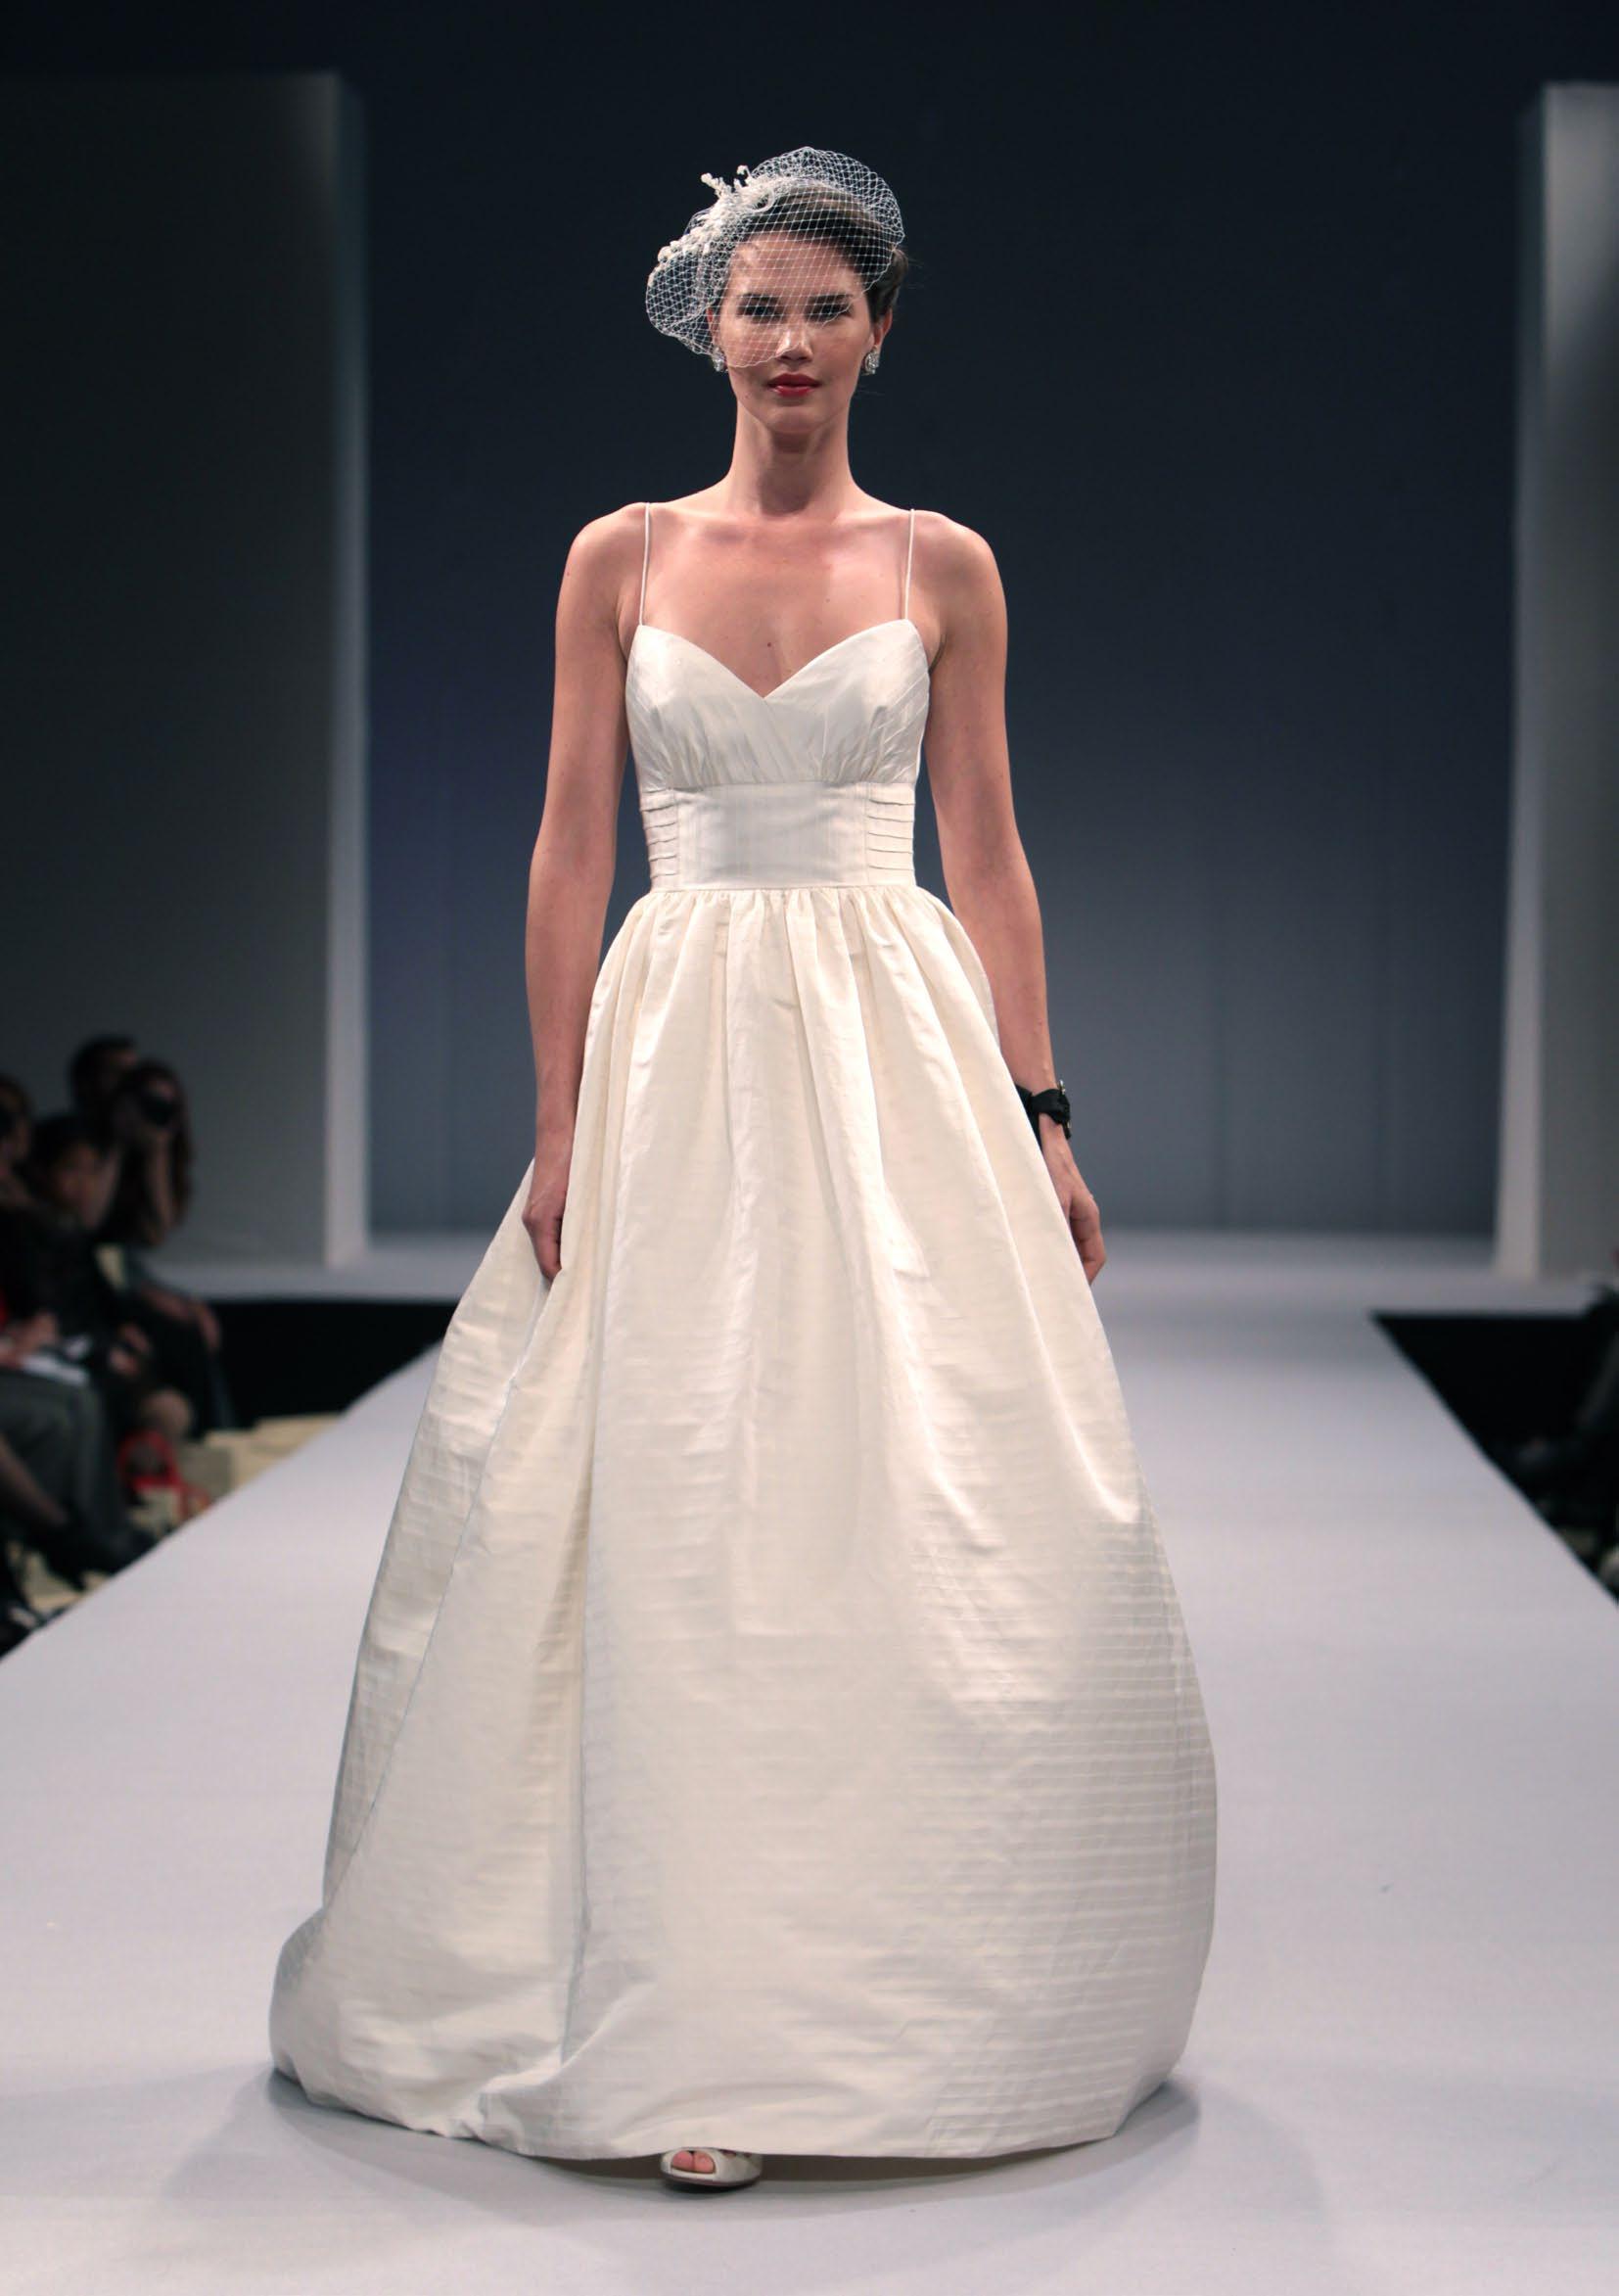 renting designer wedding dresses photo - 1